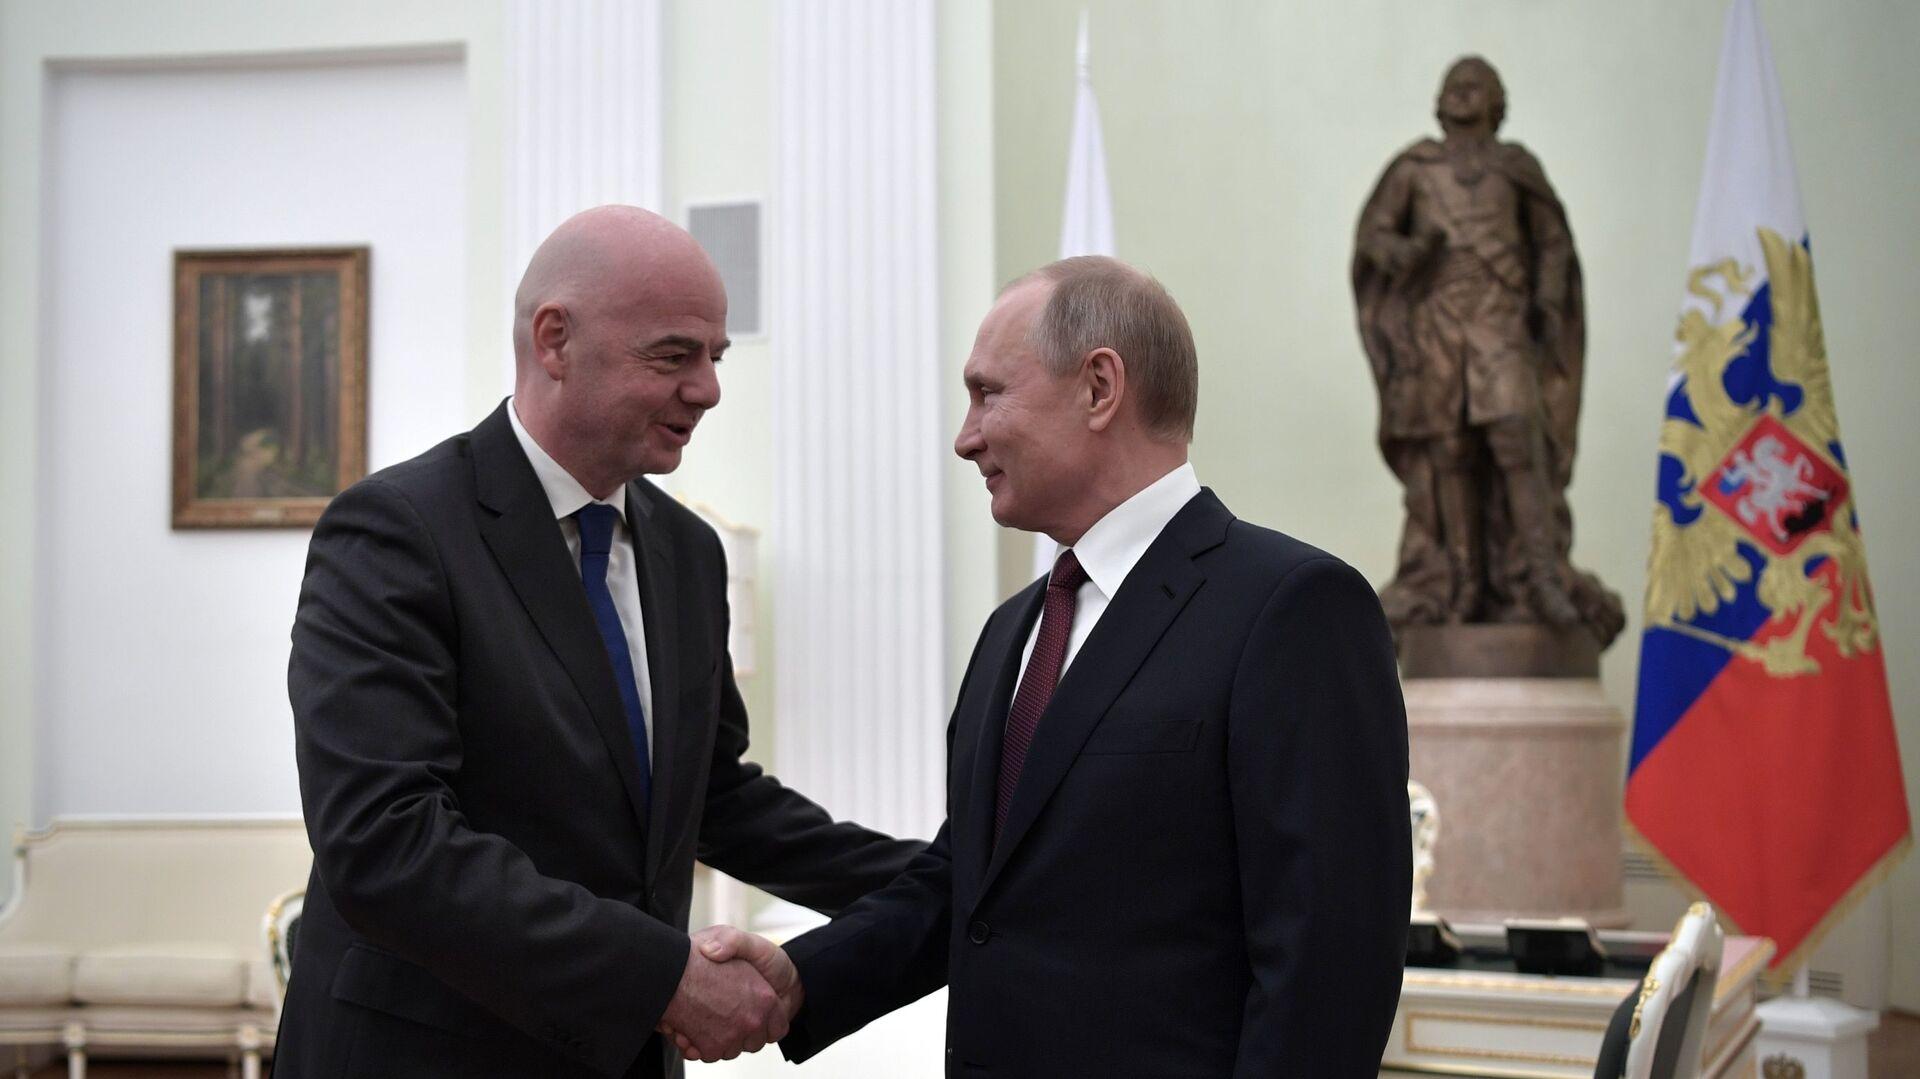 Президент РФ Владимир Путин и президент ФИФА Джанни Инфантино во время встречи - РИА Новости, 1920, 21.06.2021